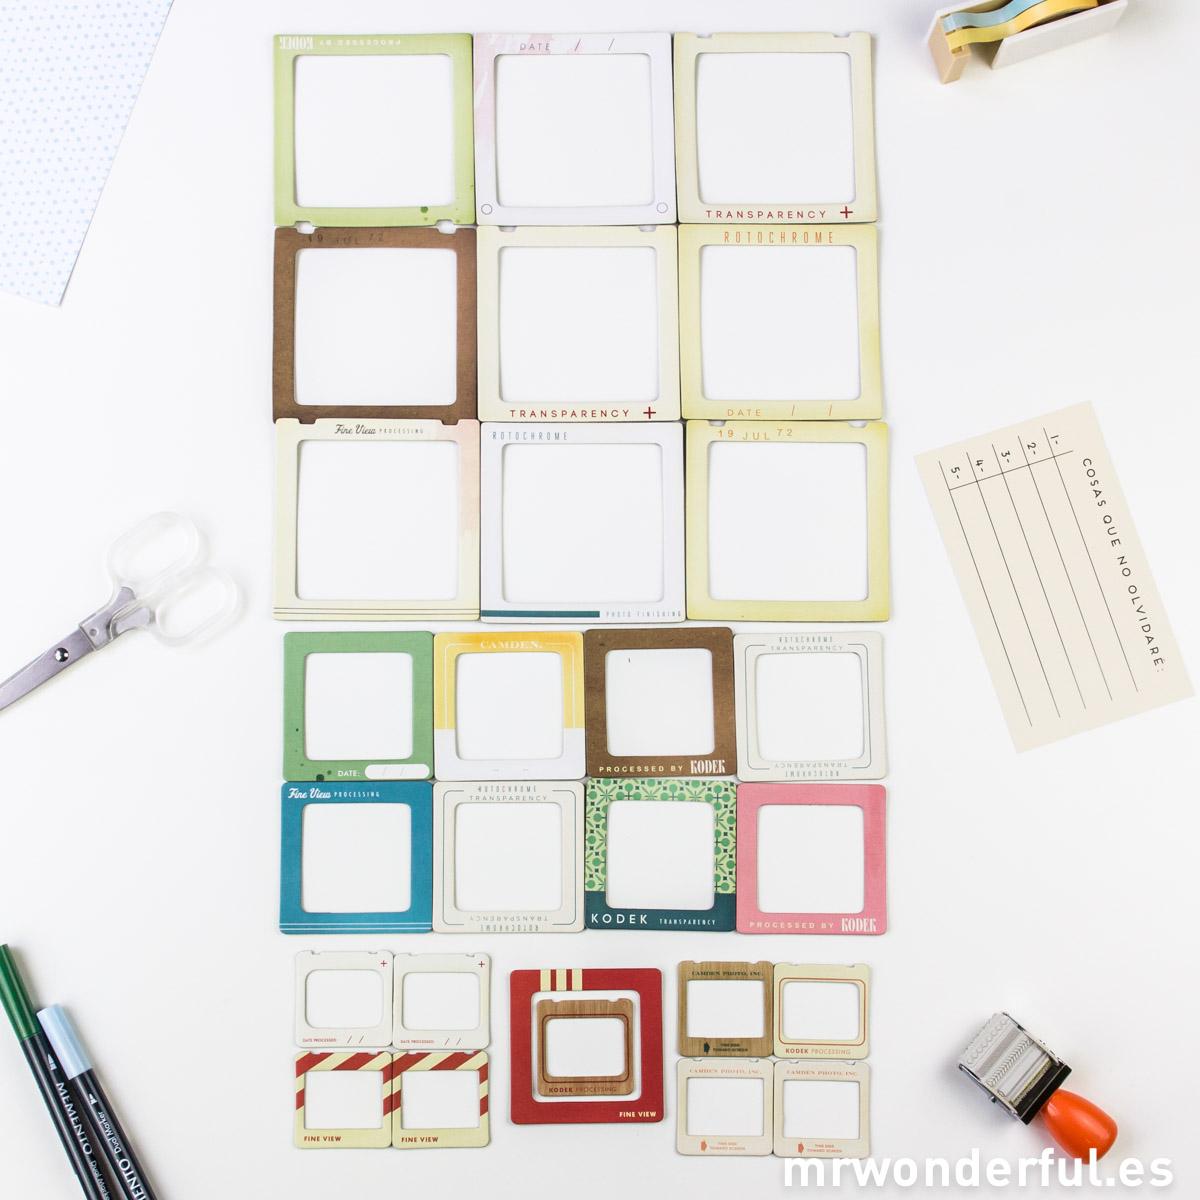 mrwonderful_683205_surtido-27-marcos-carton-diferentes-tamaños-2